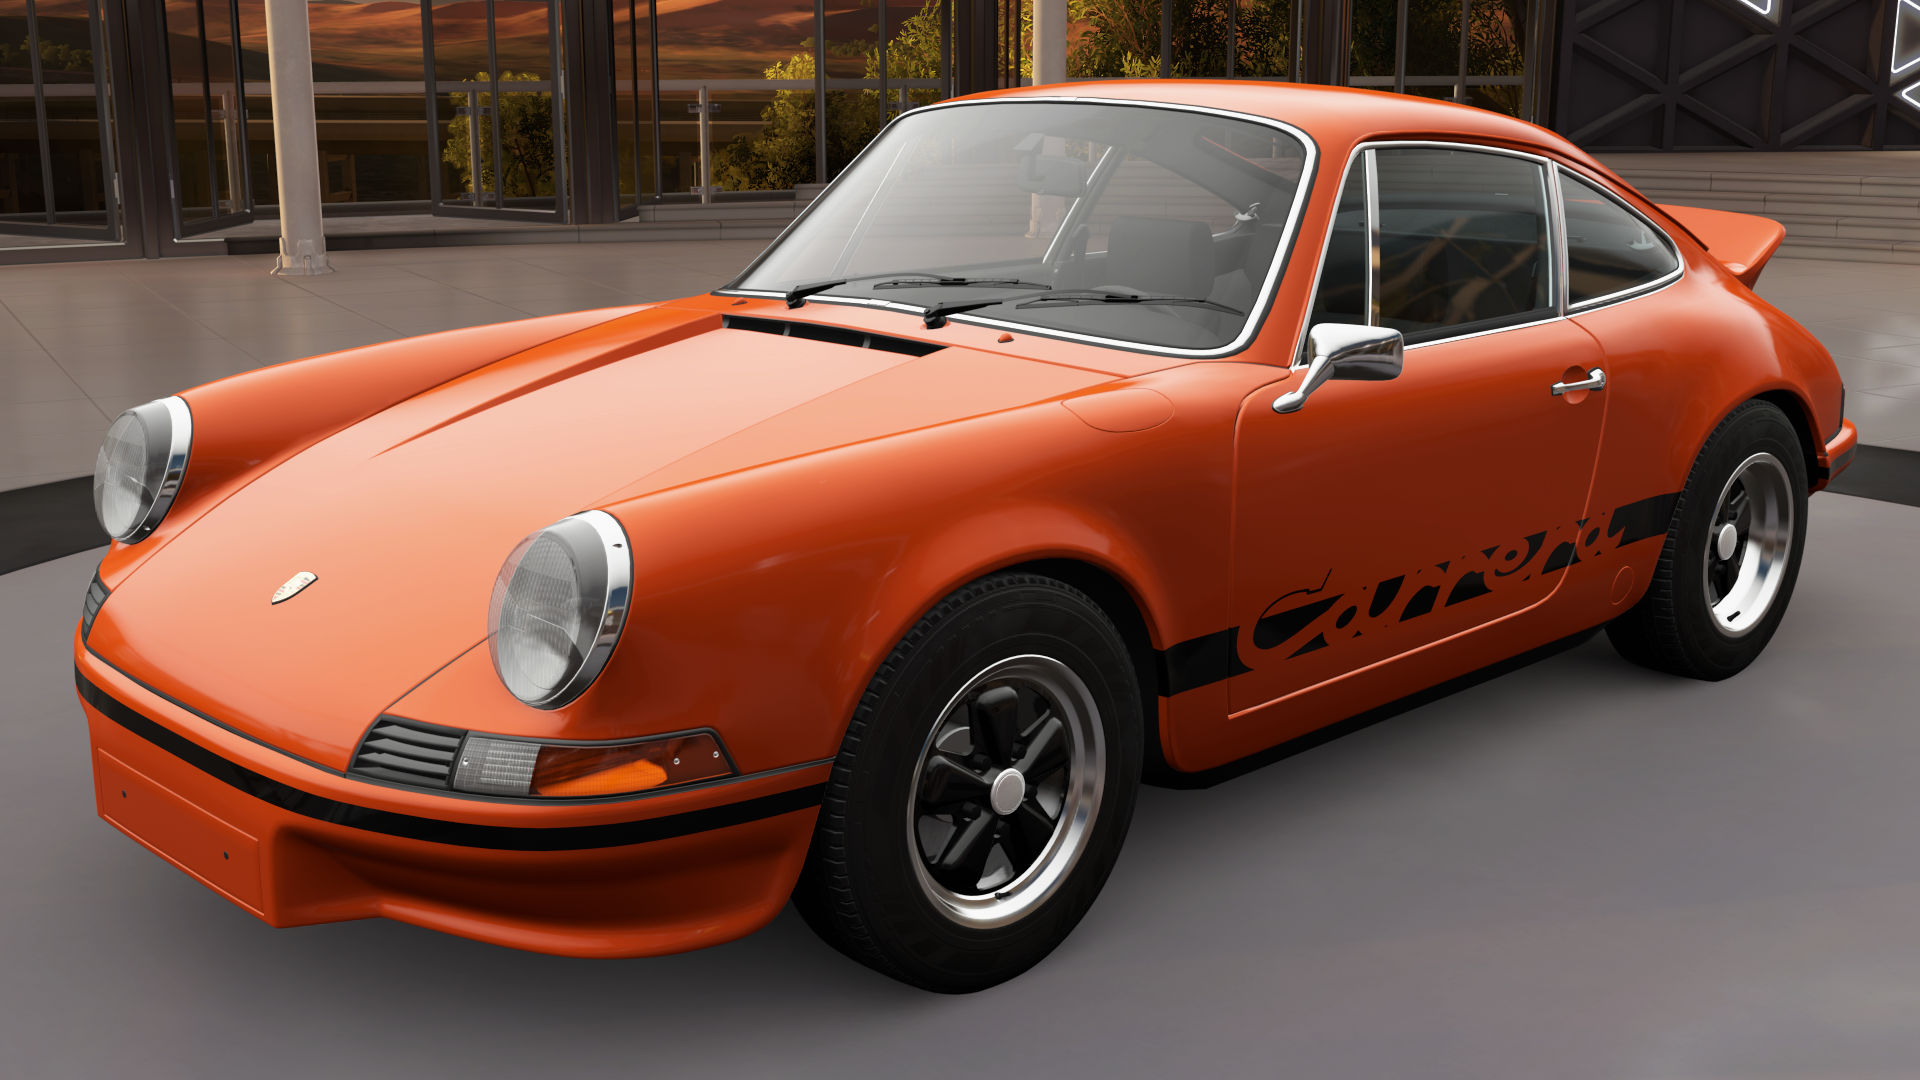 Porsche 911 Carrera RS | Forza Motorsport Wiki | FANDOM powered by